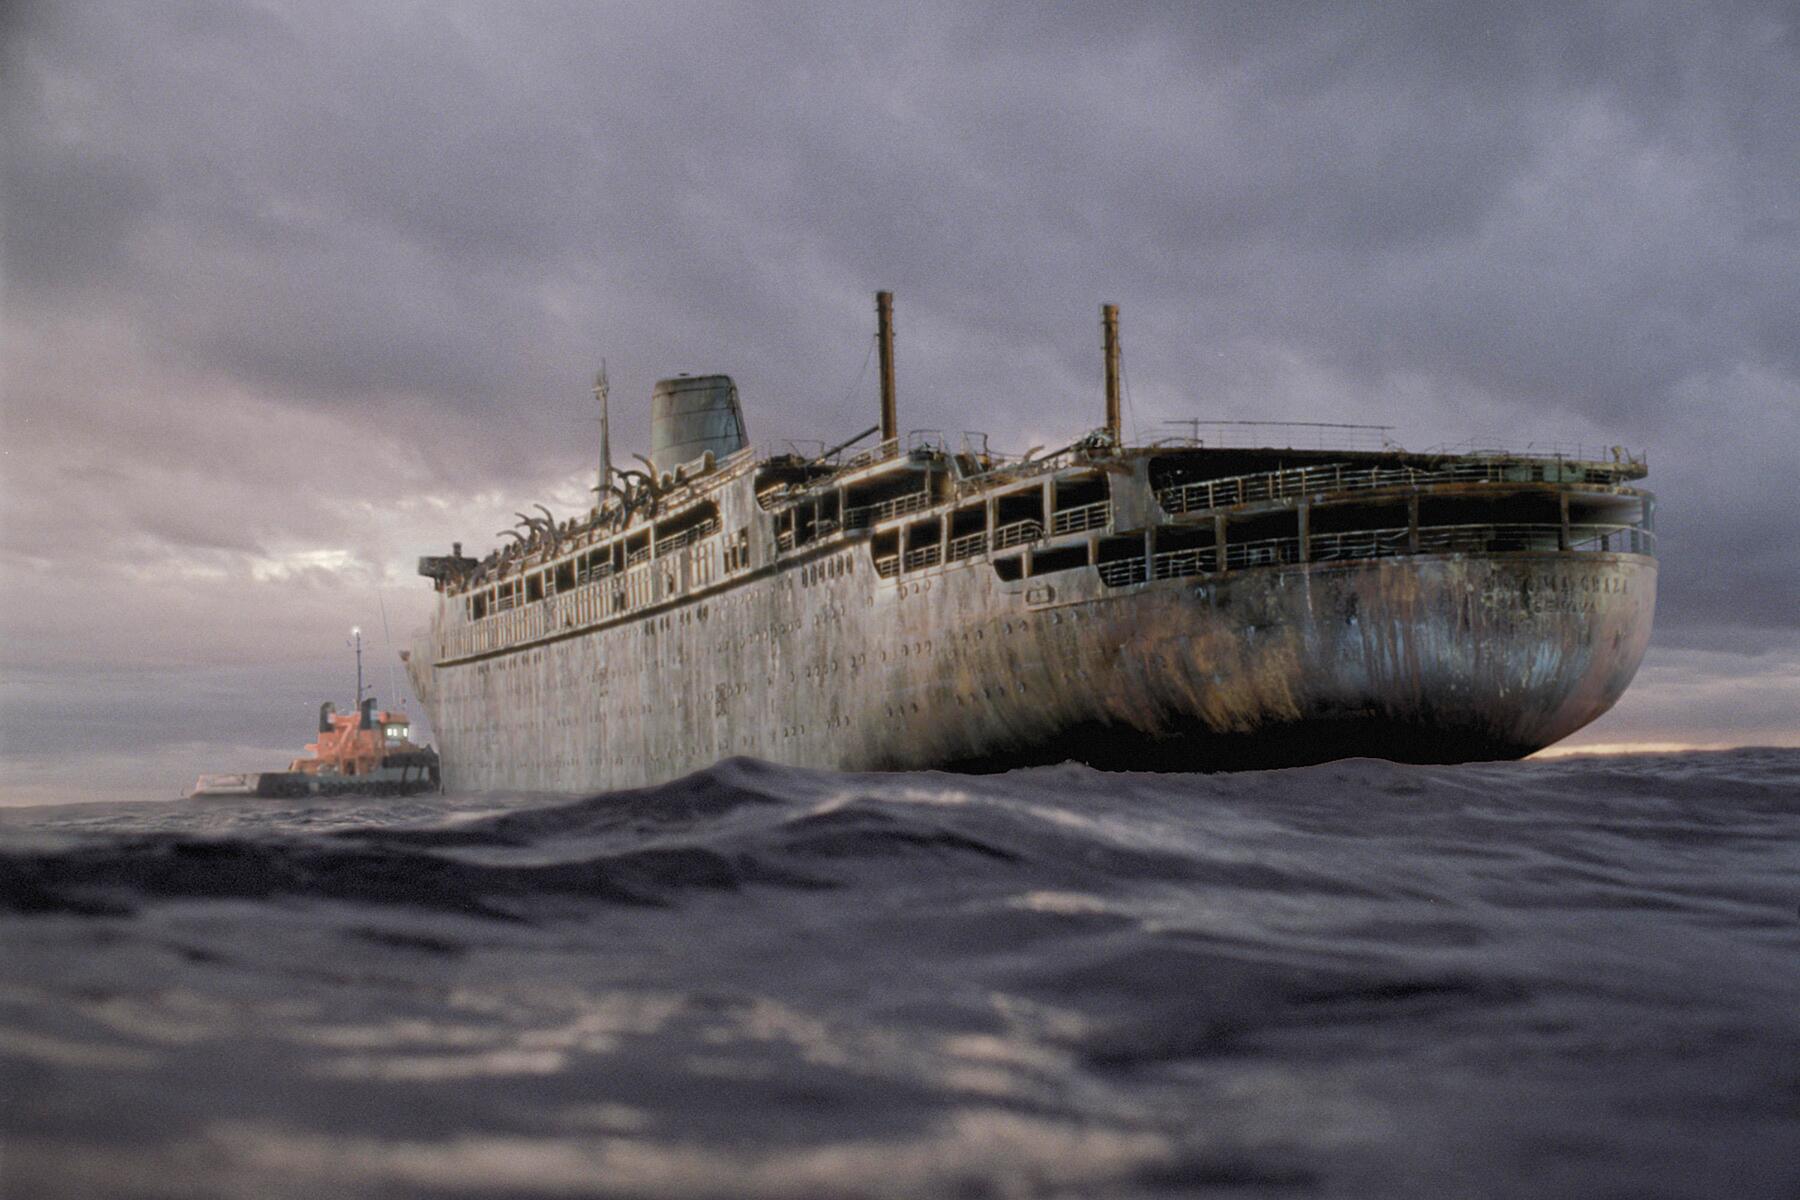 ghost ship (2002 film)